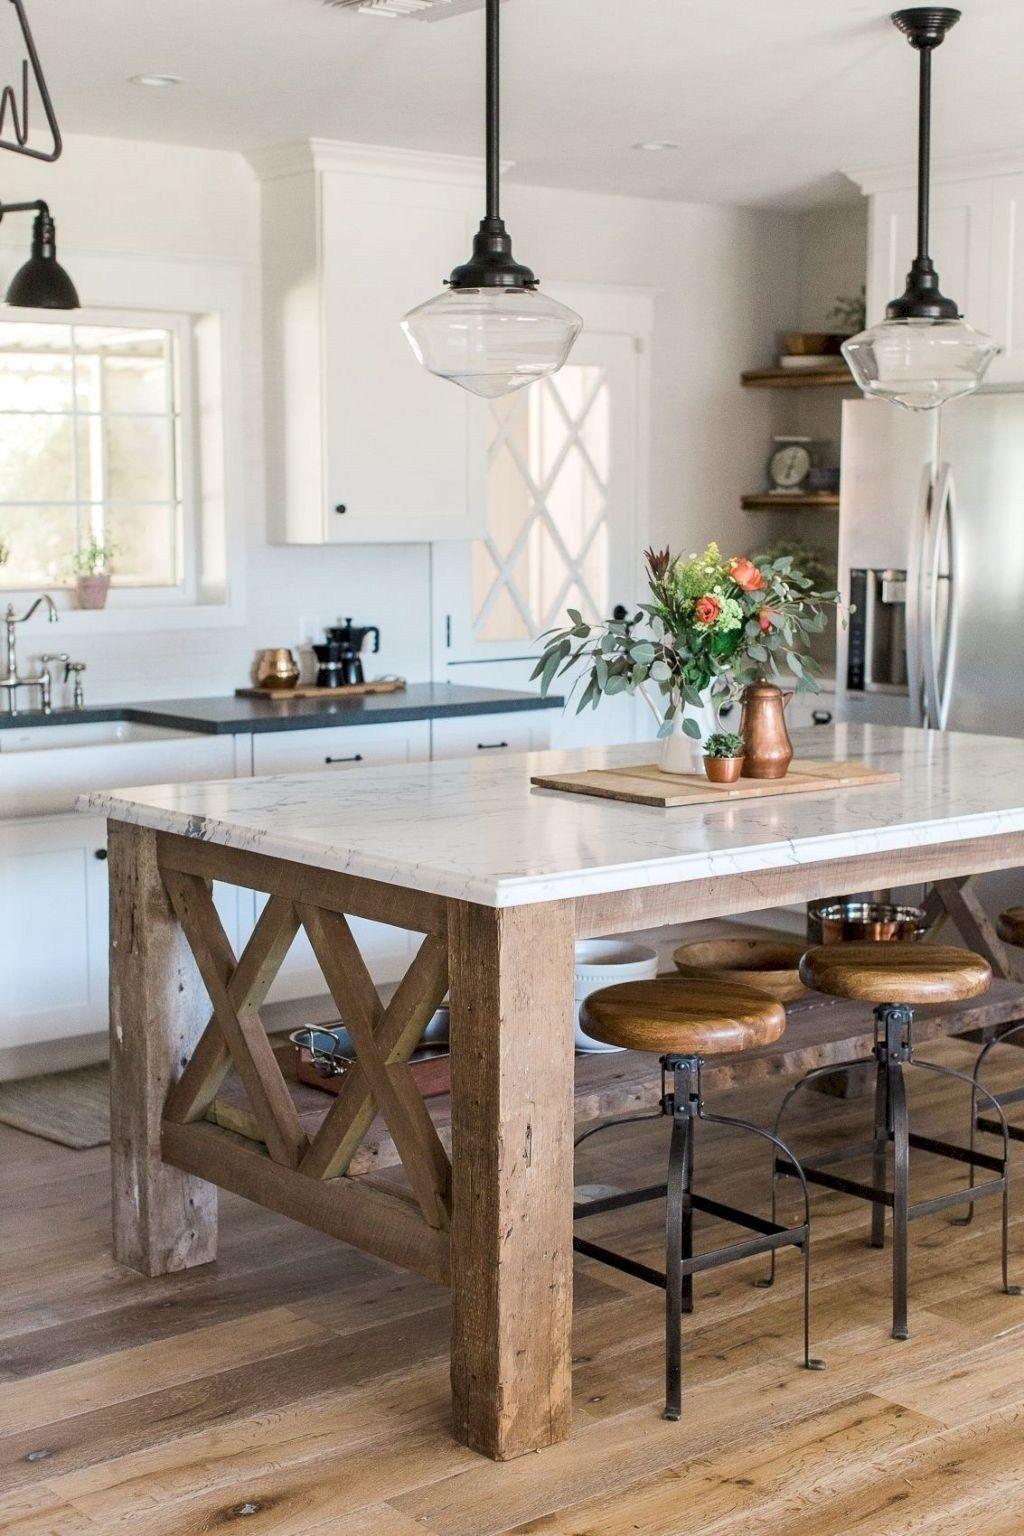 20+ Hottest Kitchen Island Decoration Ideas #islandkitchenideas